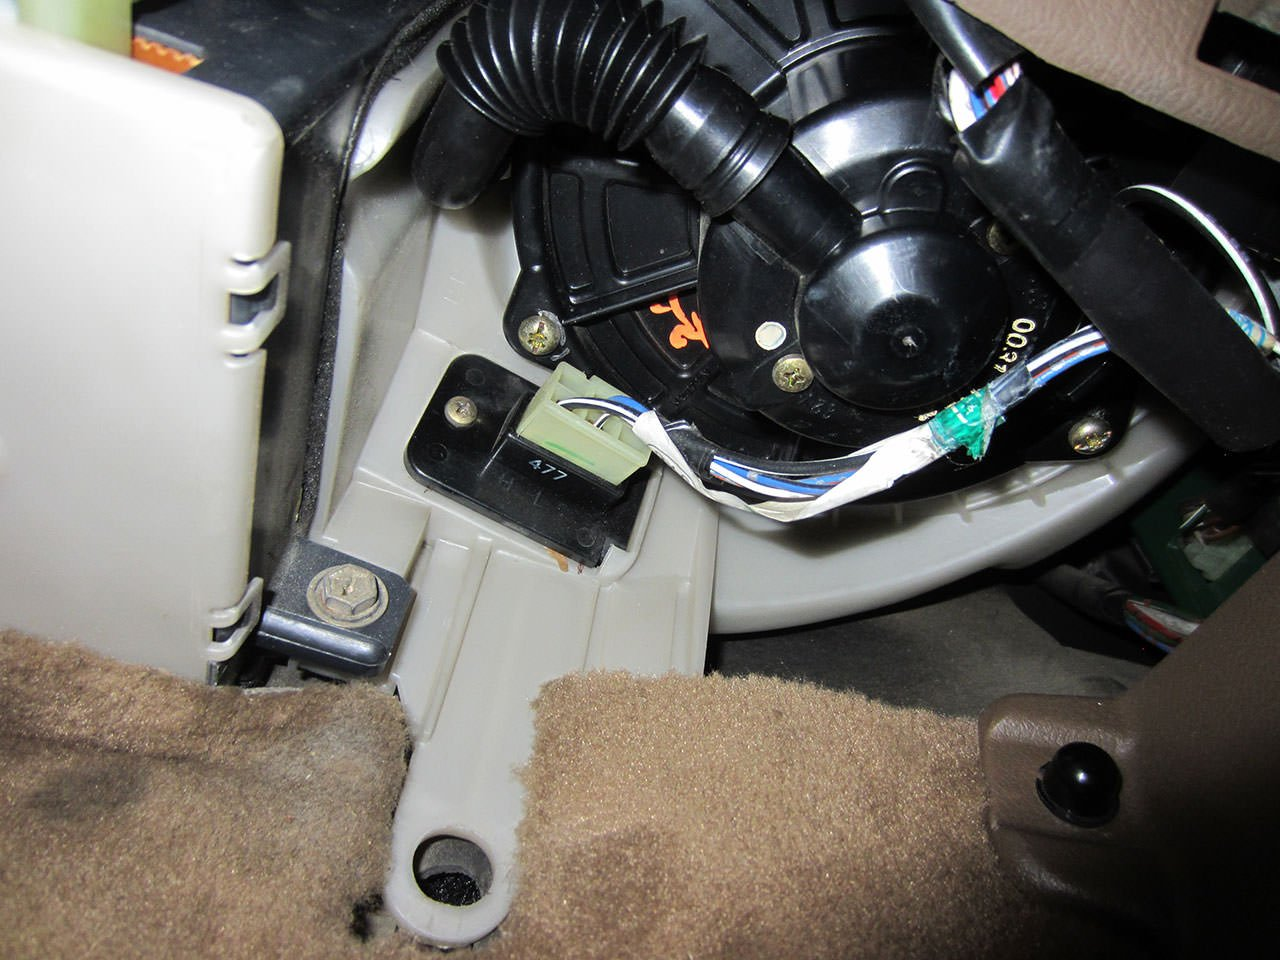 2013 2018 Toyota Tundra Double Cab Black Loop Driver /& Passenger Floor 2015 2014 2016 2017 GGBAILEY D50795-F1A-BK-LP Custom Fit Car Mats for 2012